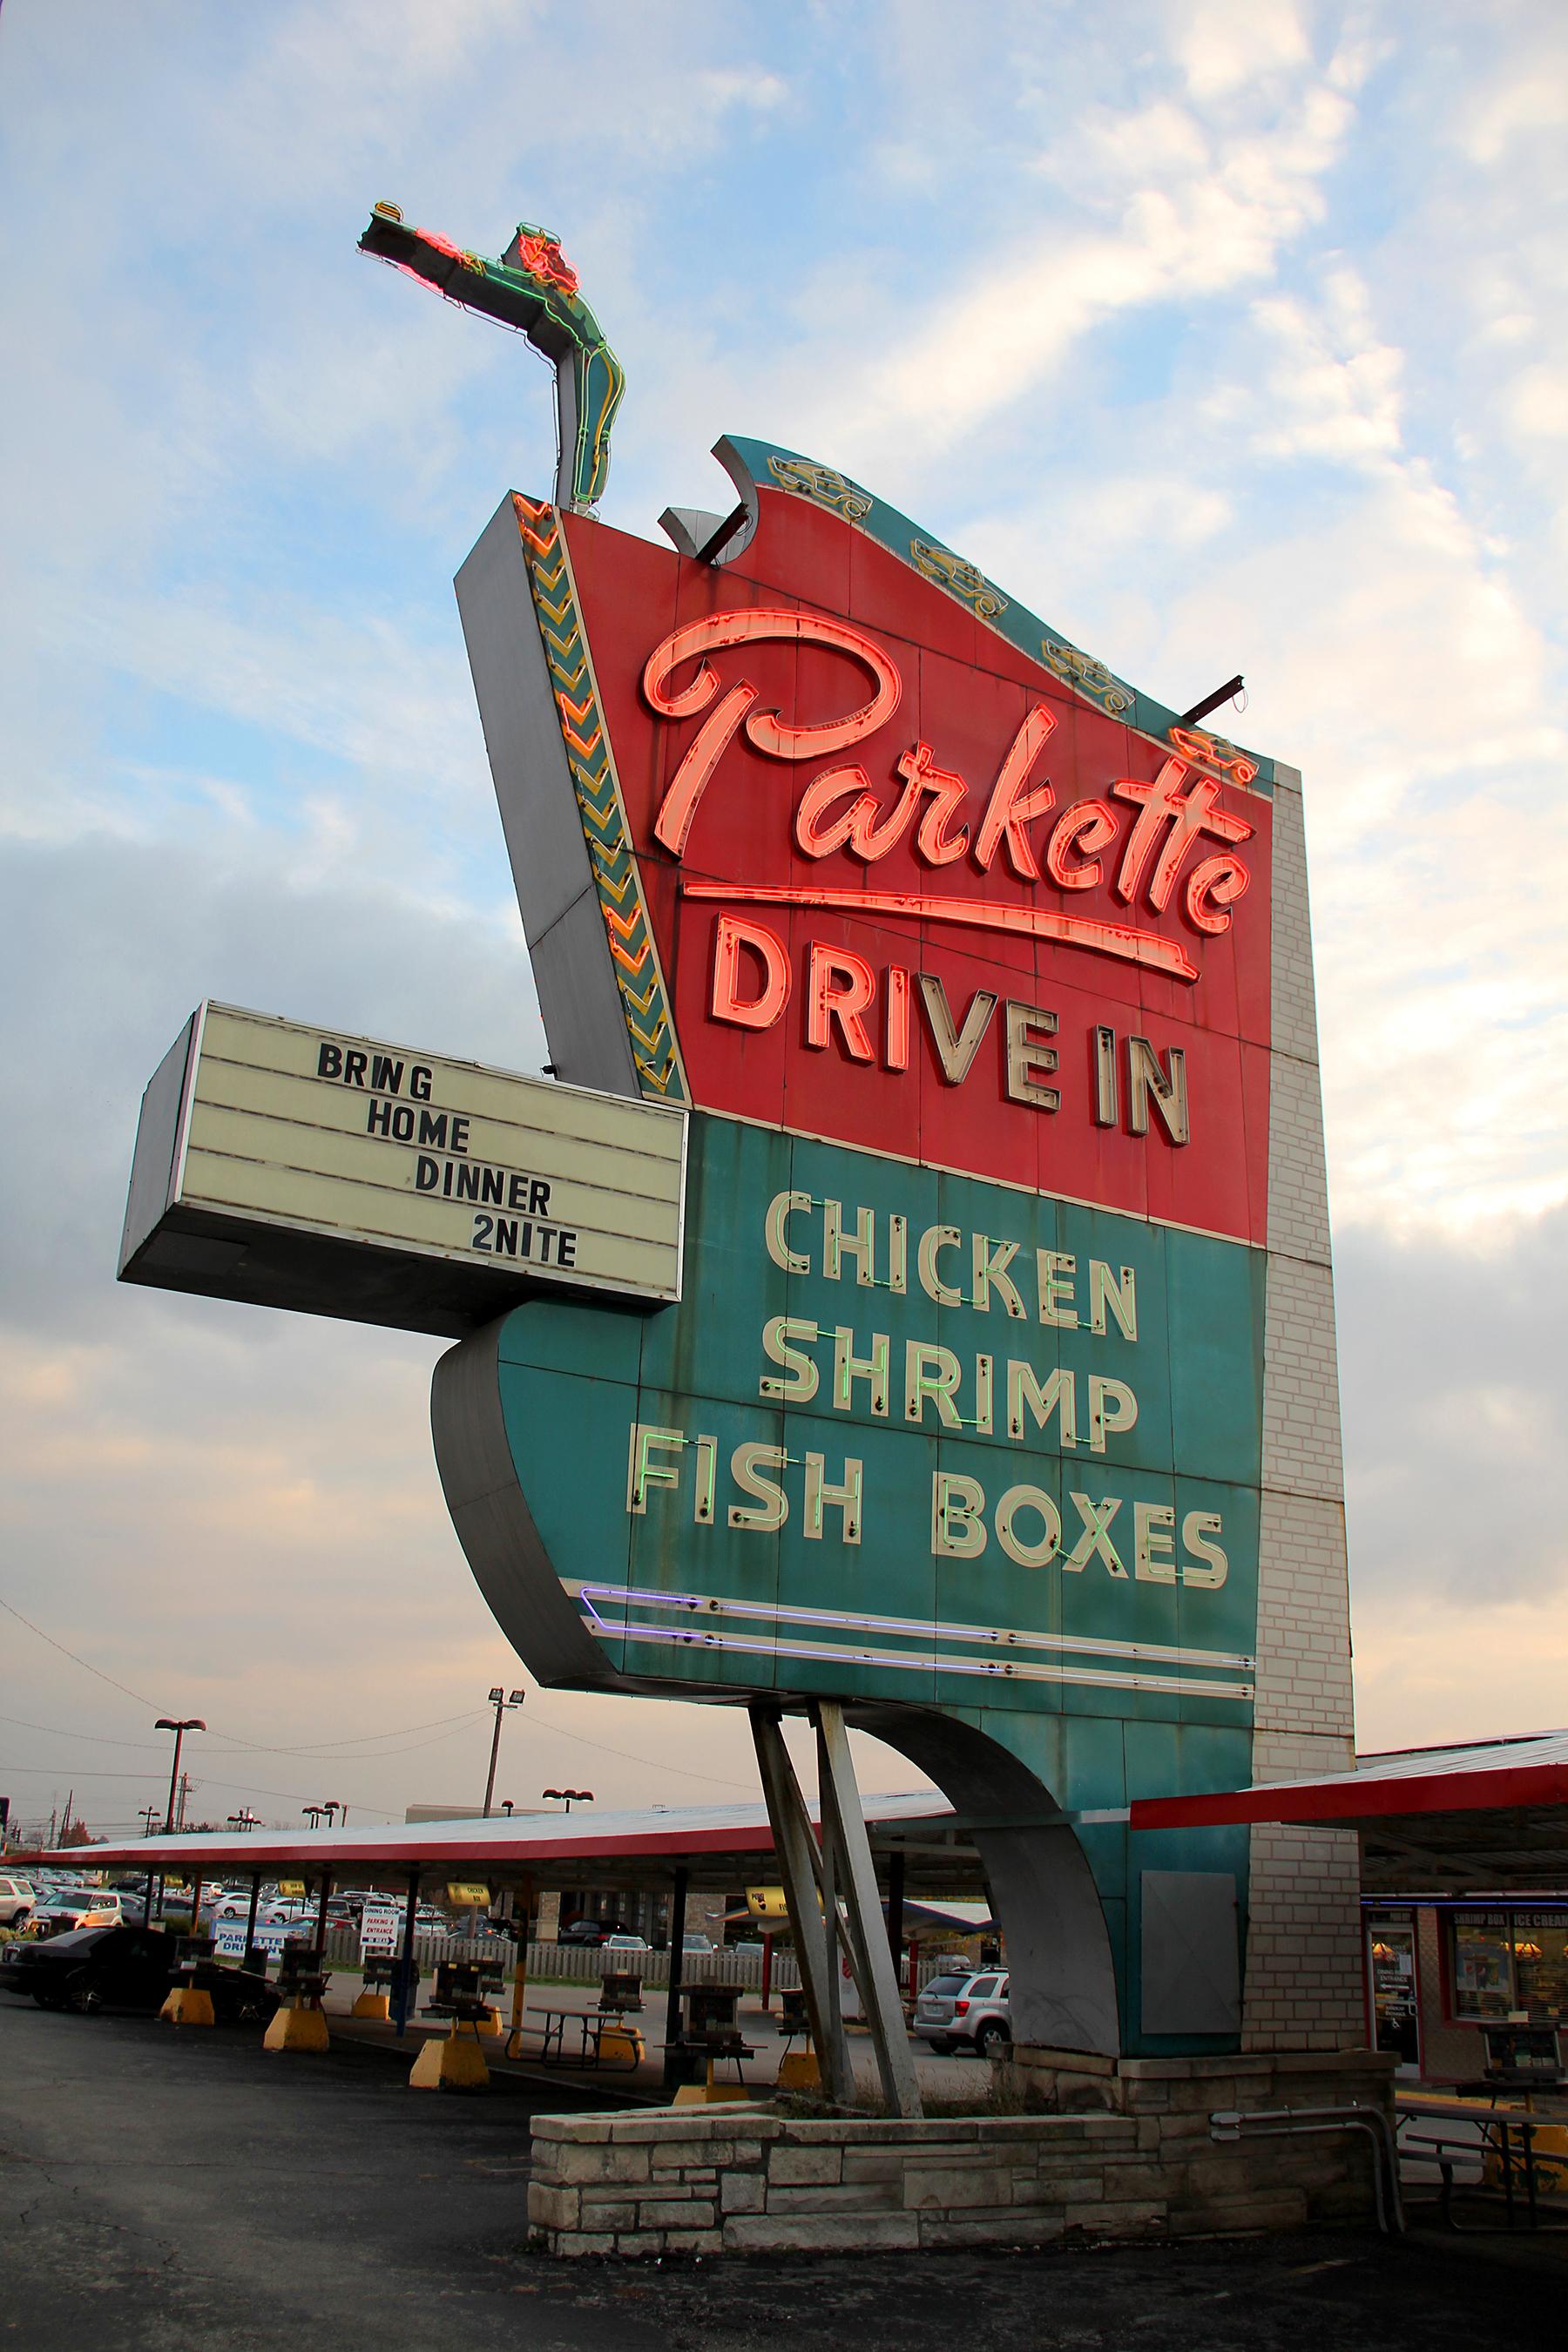 Parkette Drive In - 1230 East New Circle Road, Lexington, Kentucky U.S.A. - November 13, 2014